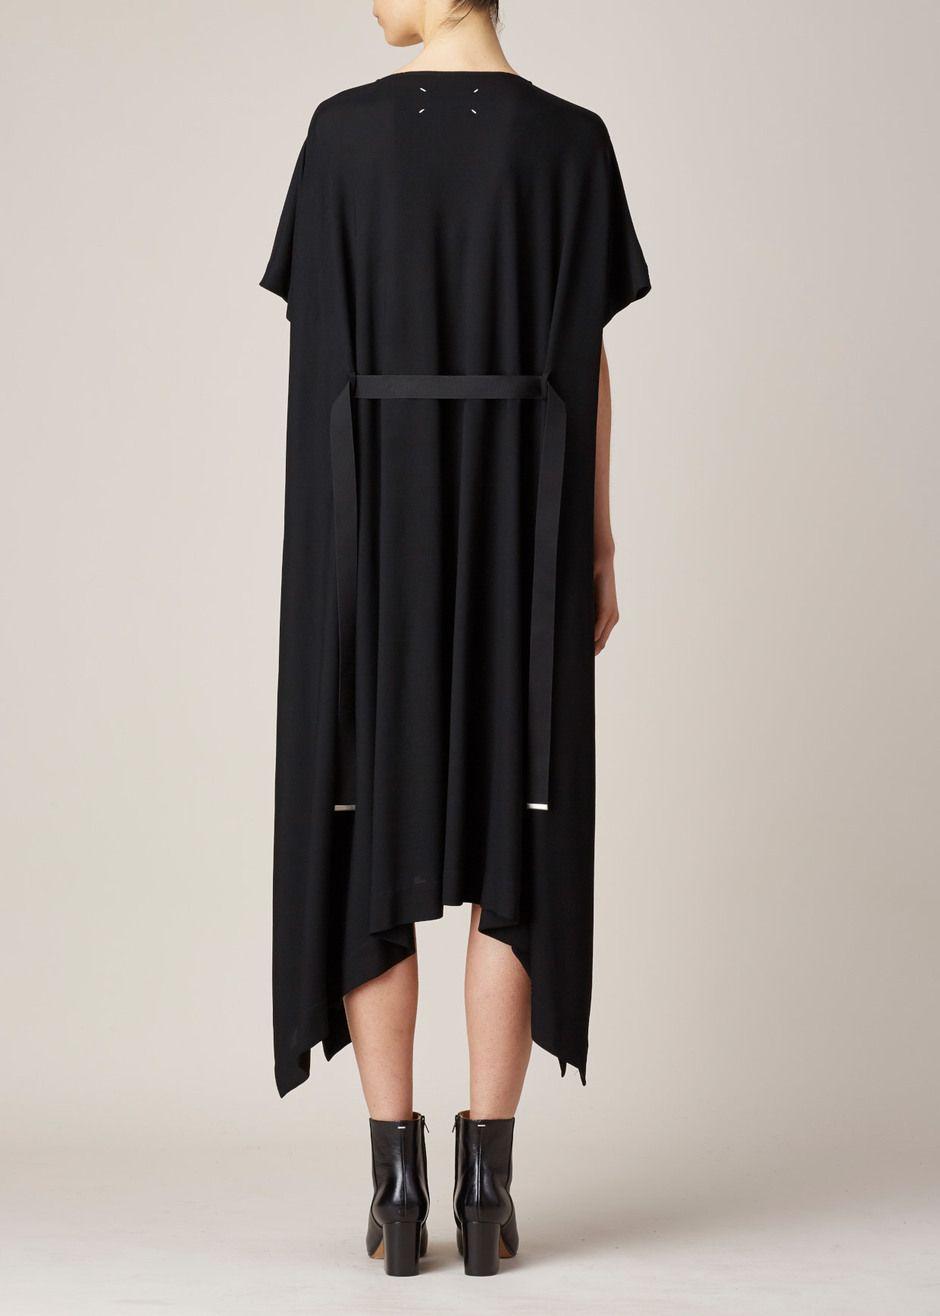 Finishline Sale Online Amazing Price For Sale back piece halter dress - Black Maison Martin Margiela Cheap Price Cost jd1m3j6jd